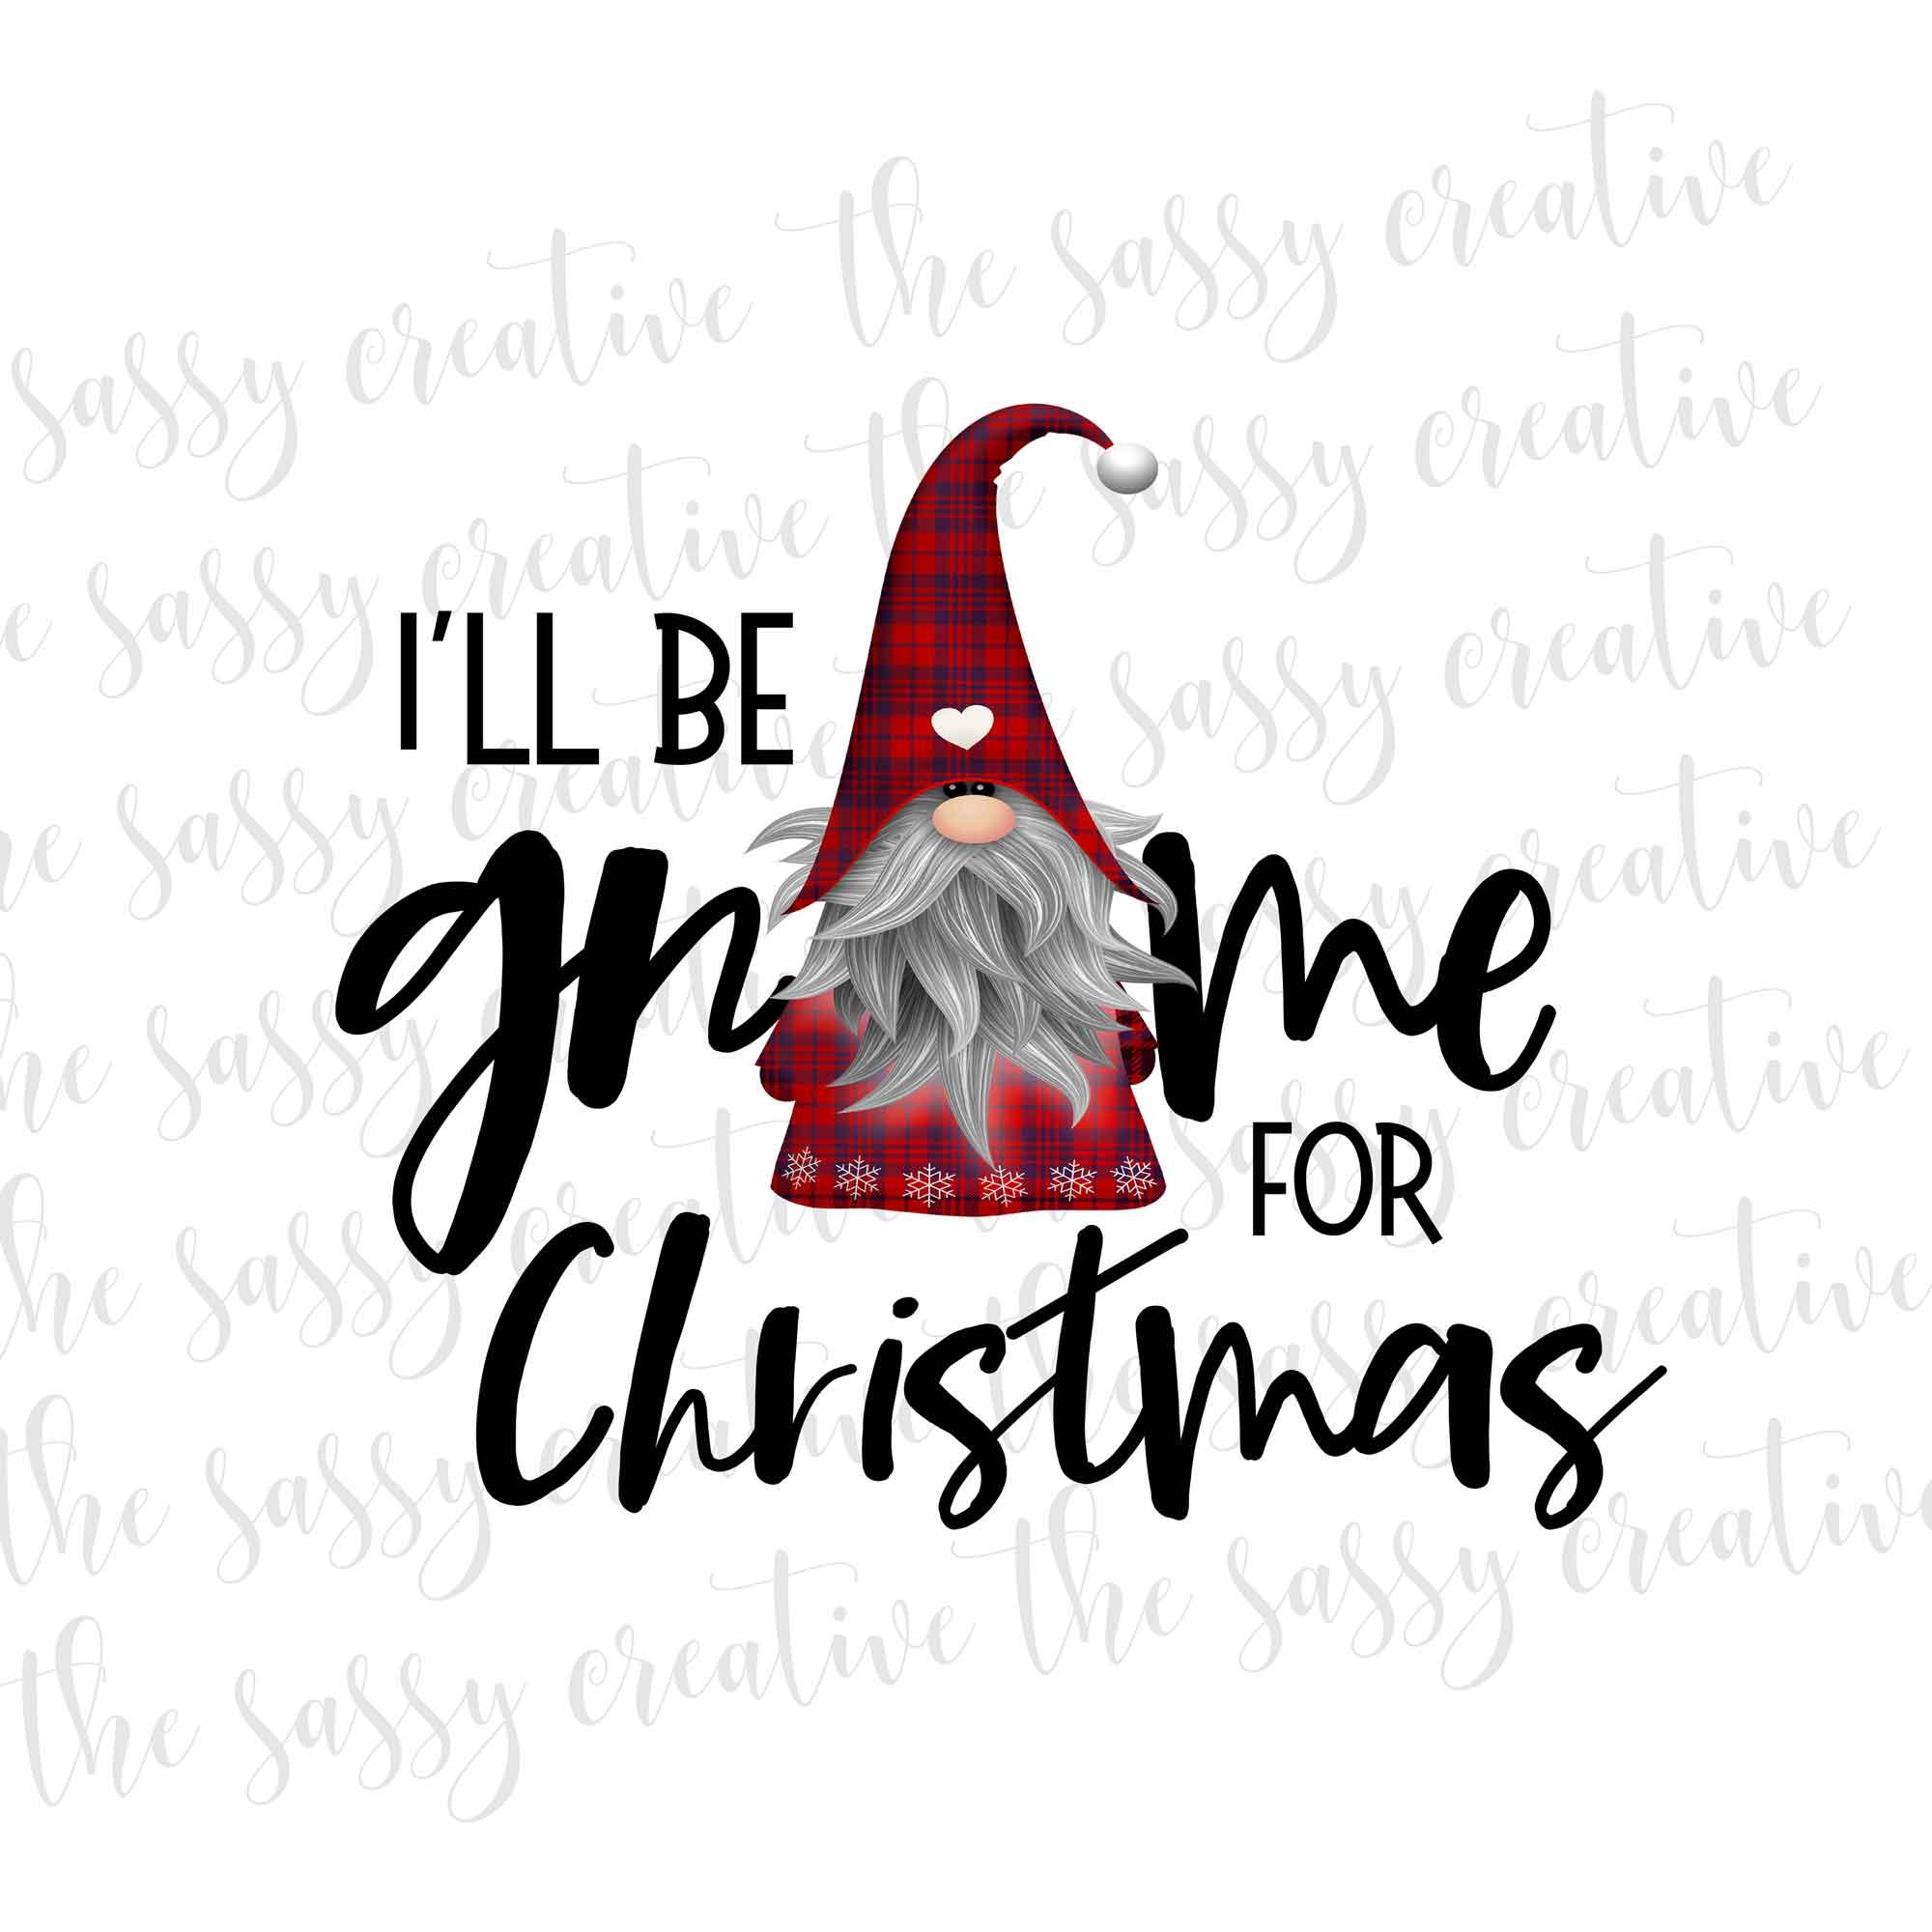 gnomeforchristmascover